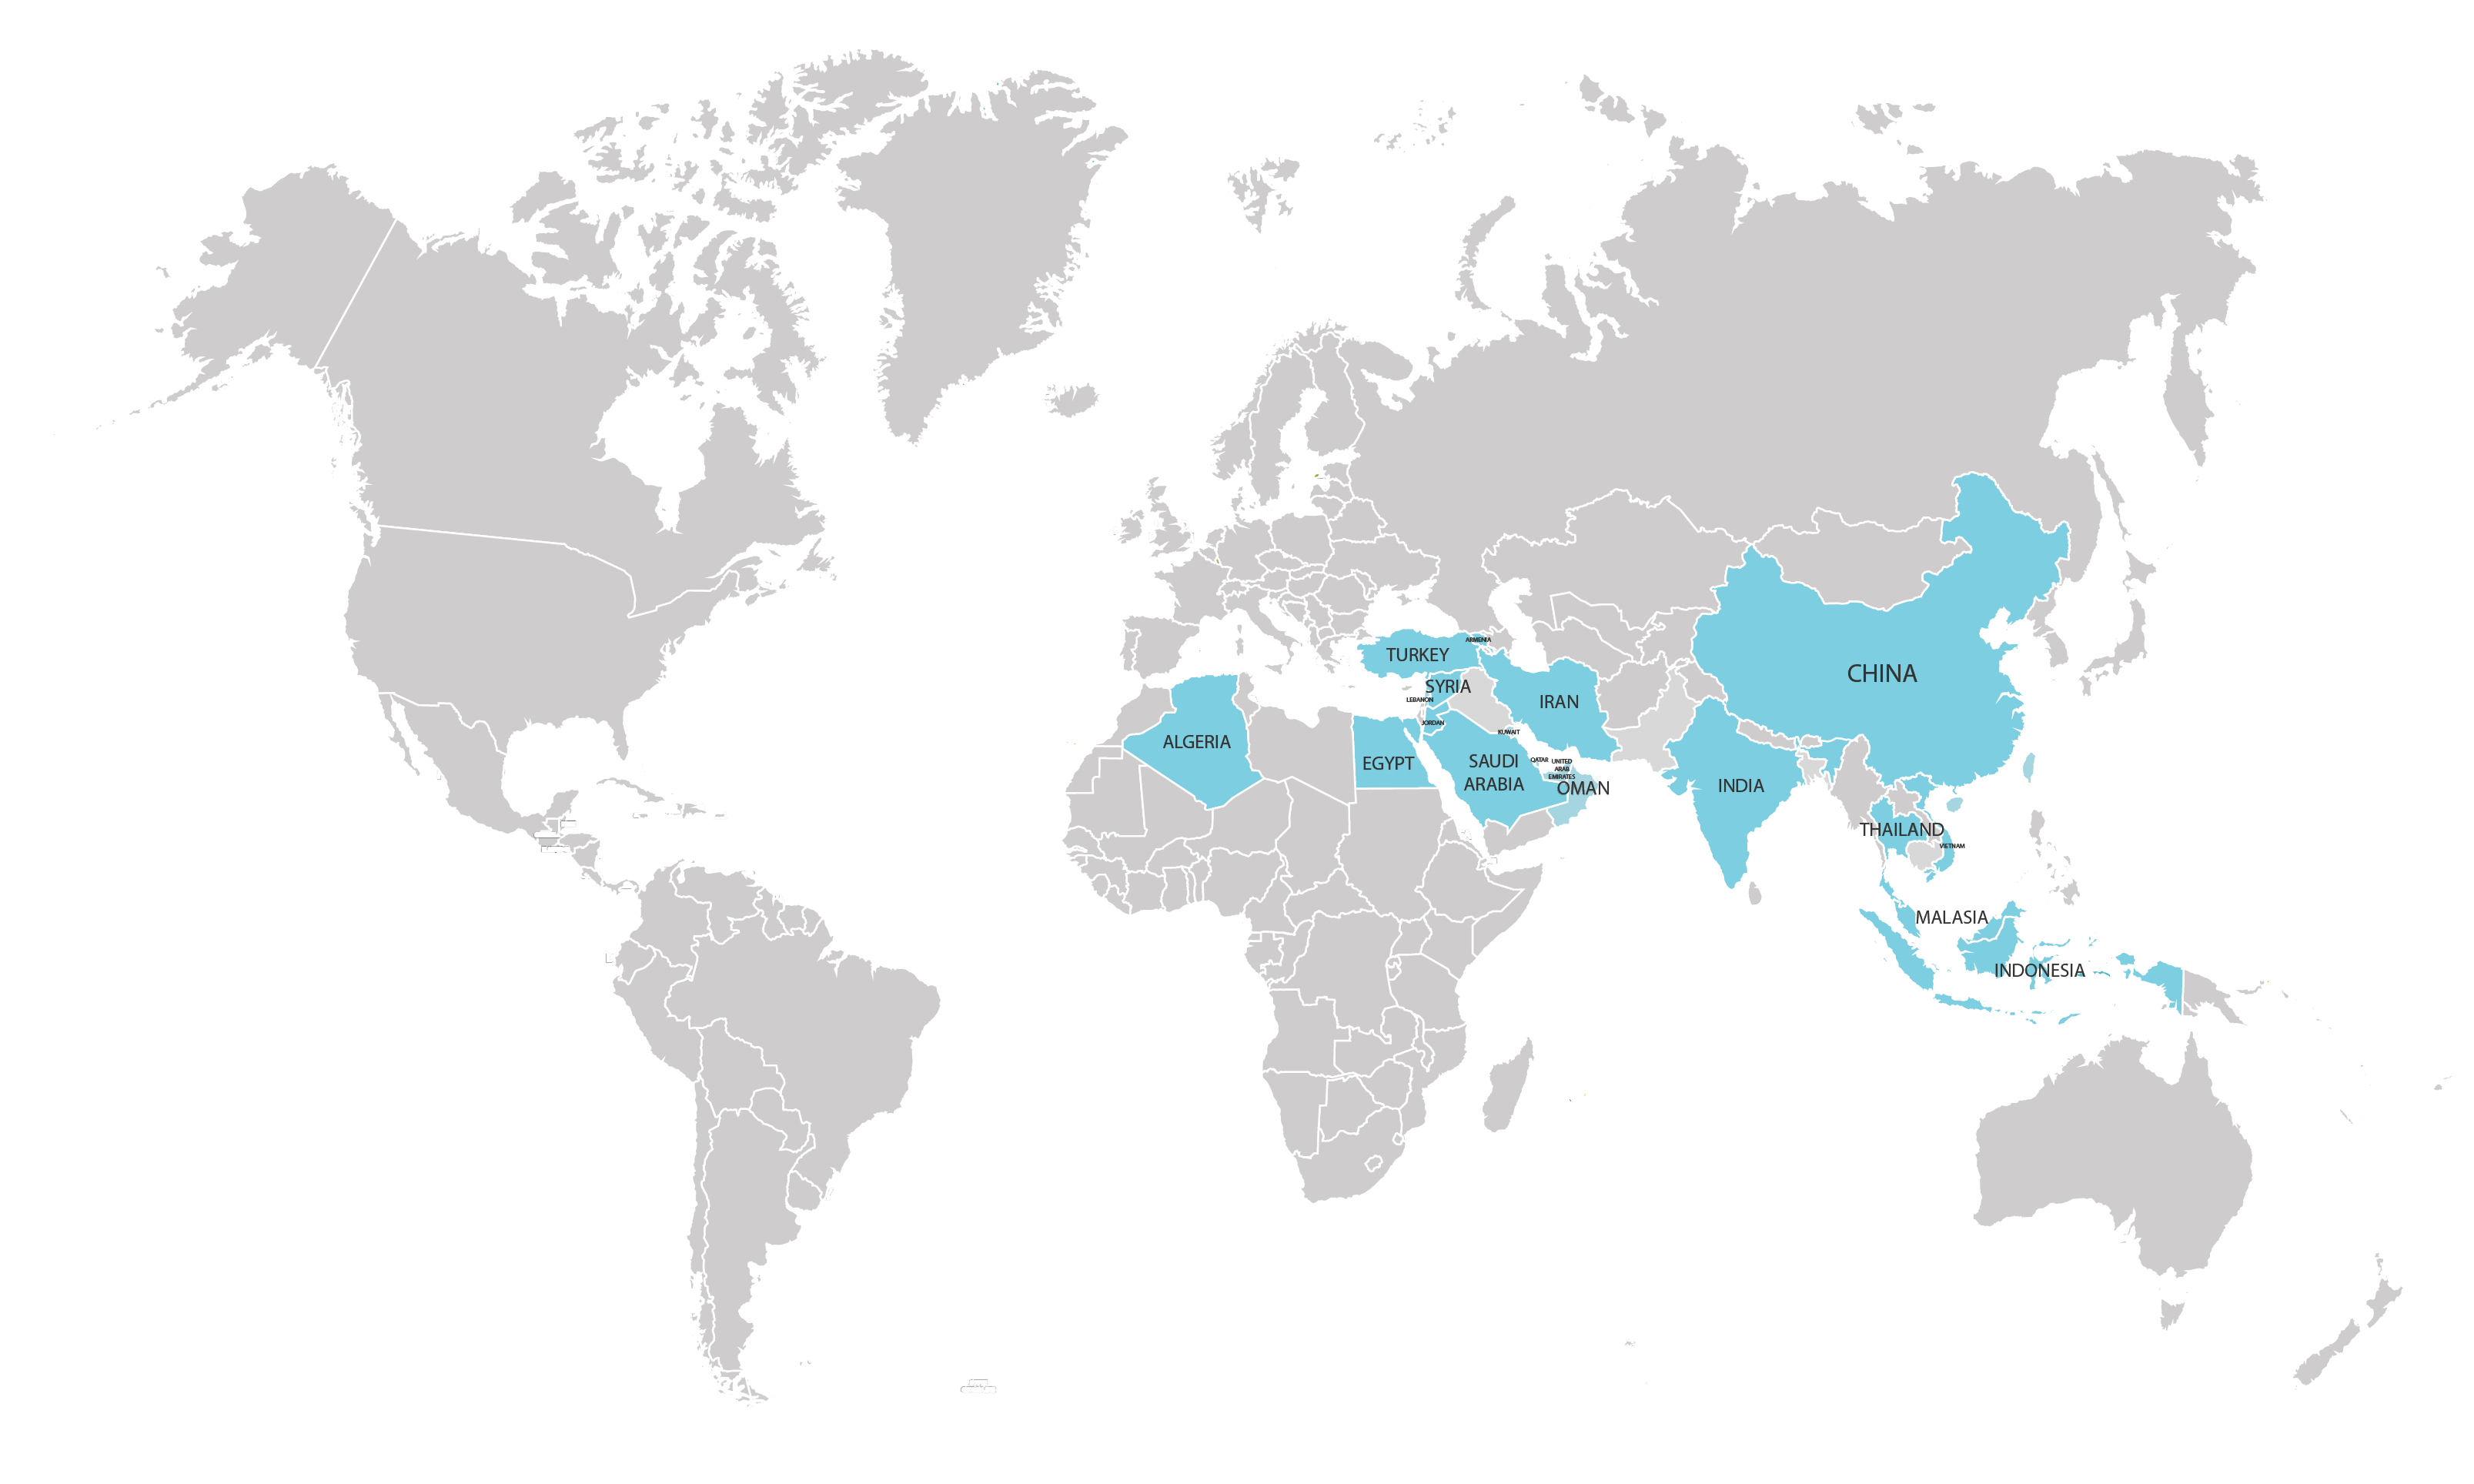 原创手绘地图广州